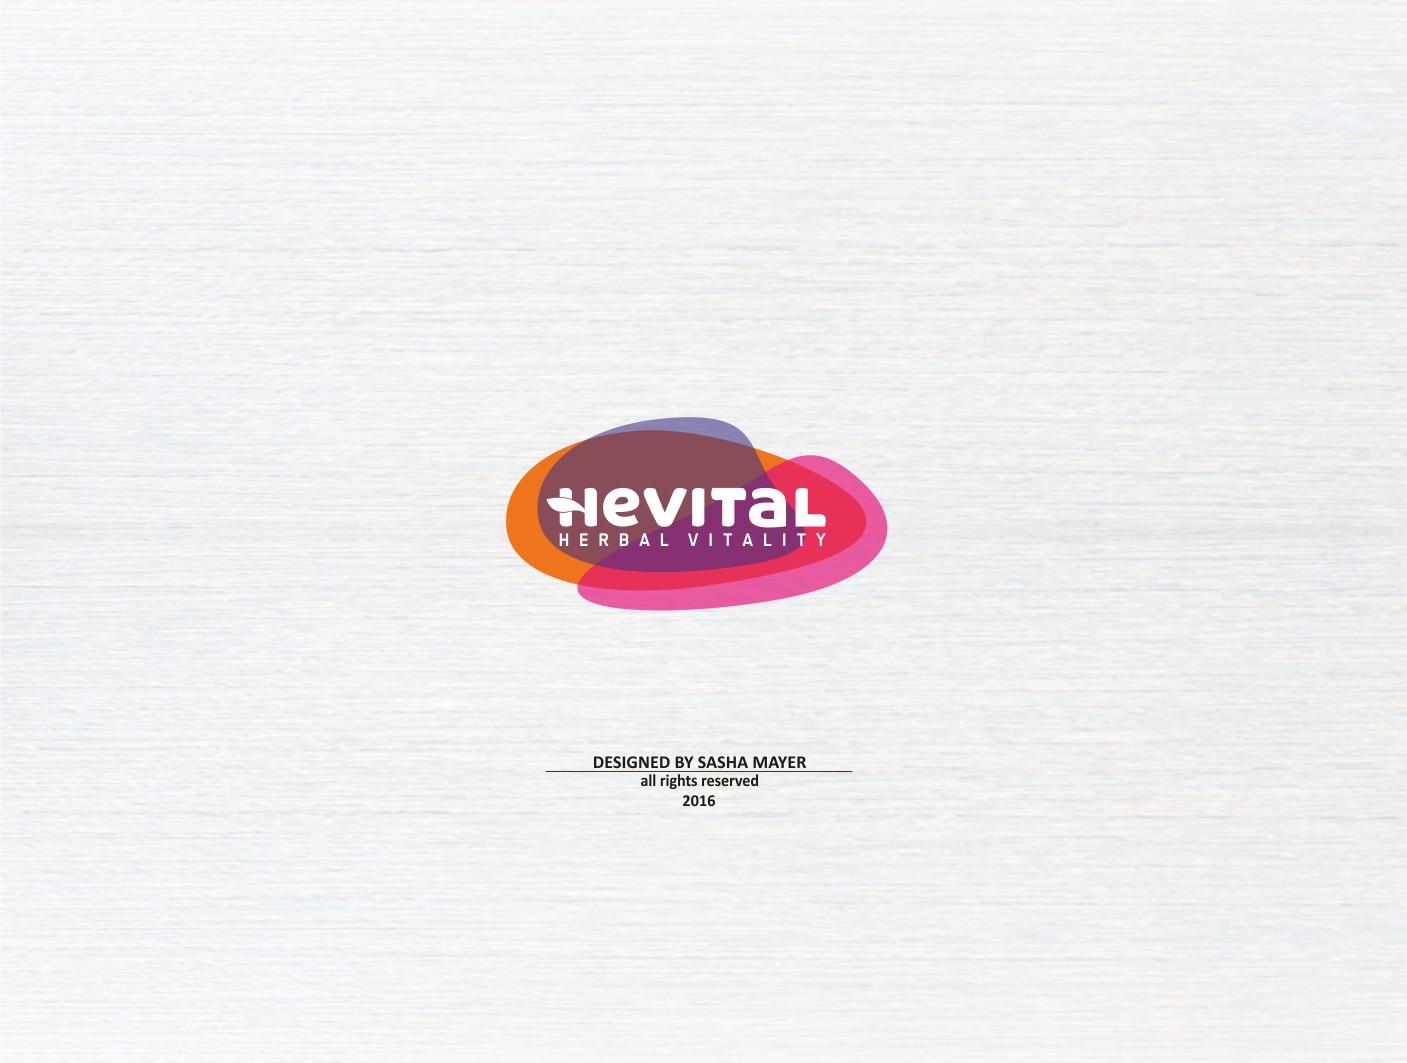 hevital